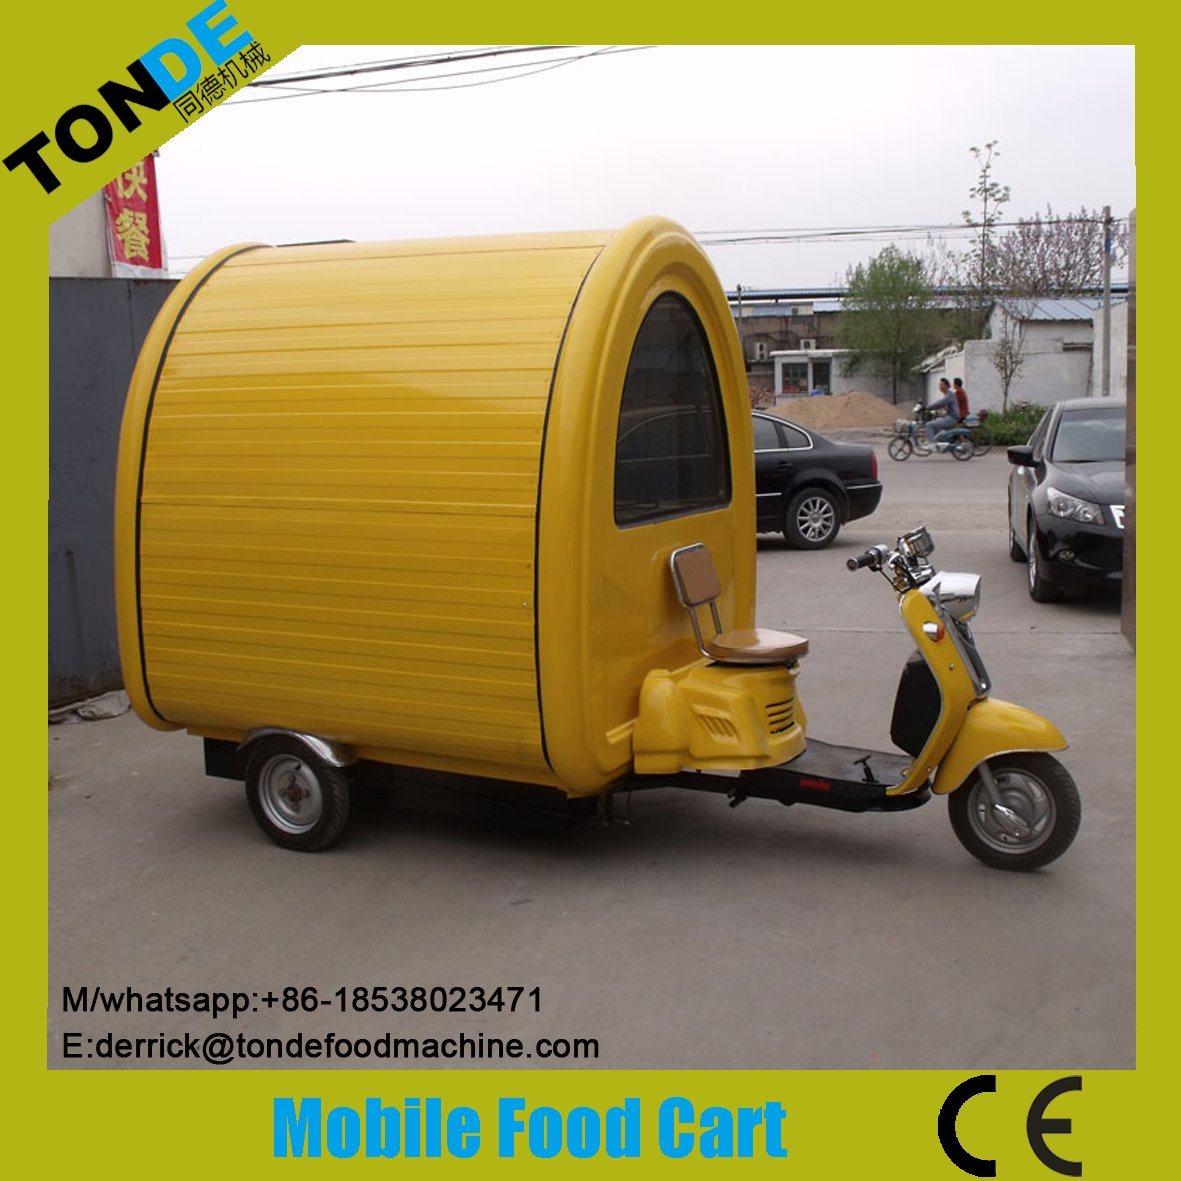 Afraic Market Mobile Food Vending Cart